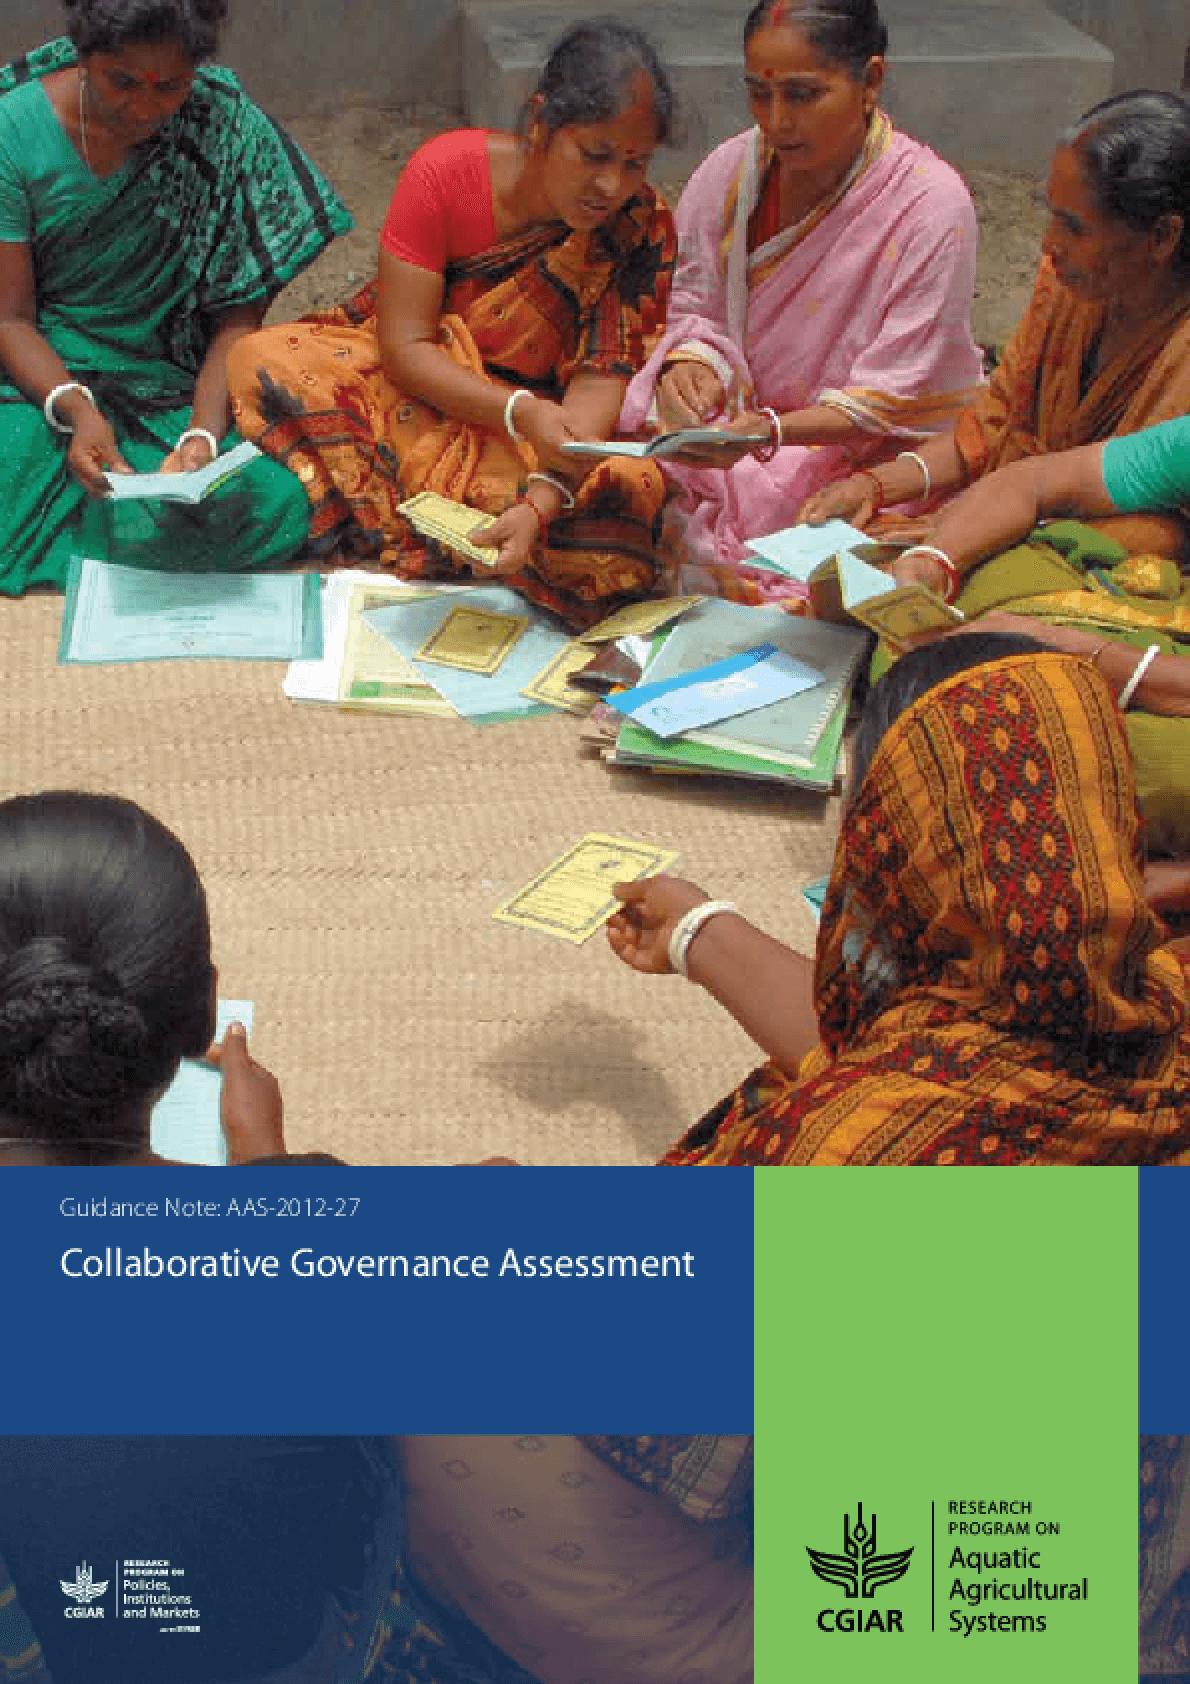 Collaborative Governance Assessment